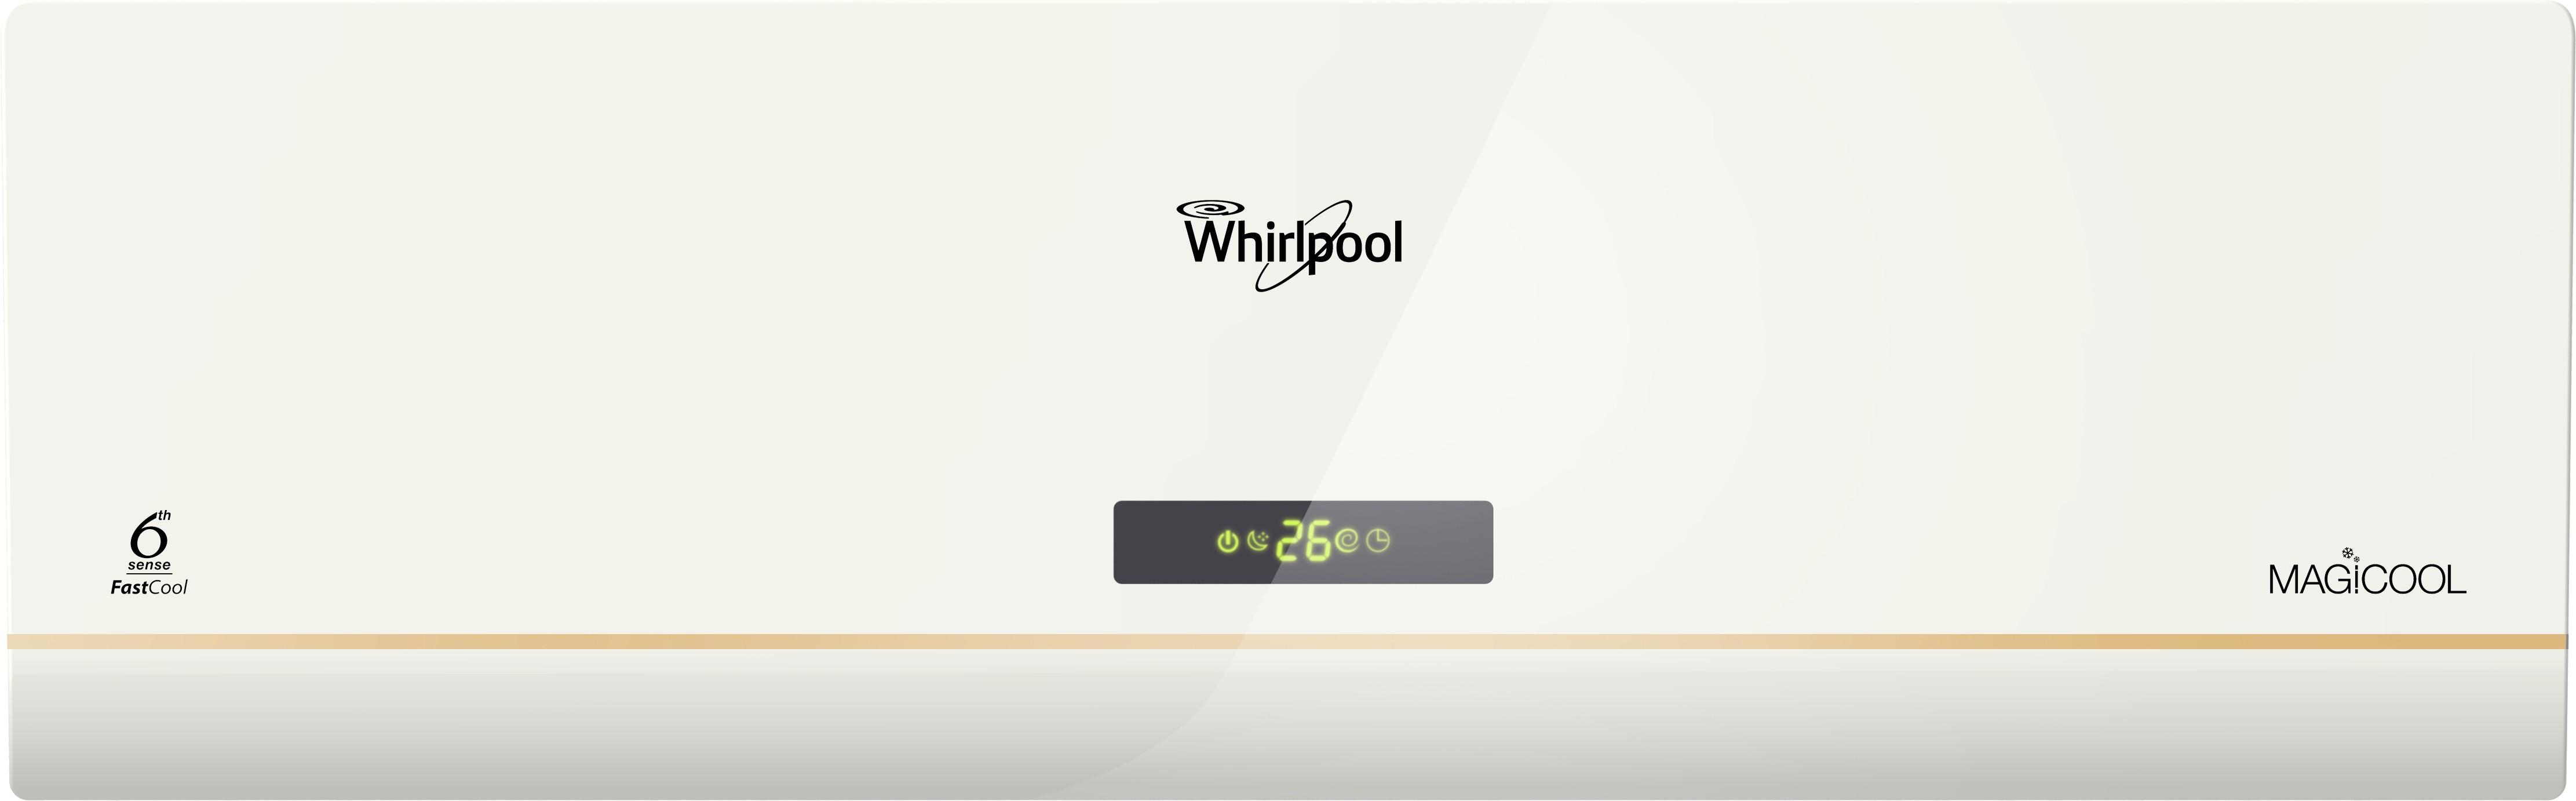 View Whirlpool 1 Ton 3 Star Split AC  - White Gold(1T MAGICOOL DLX COPR 3S, Copper Condenser)  Price Online